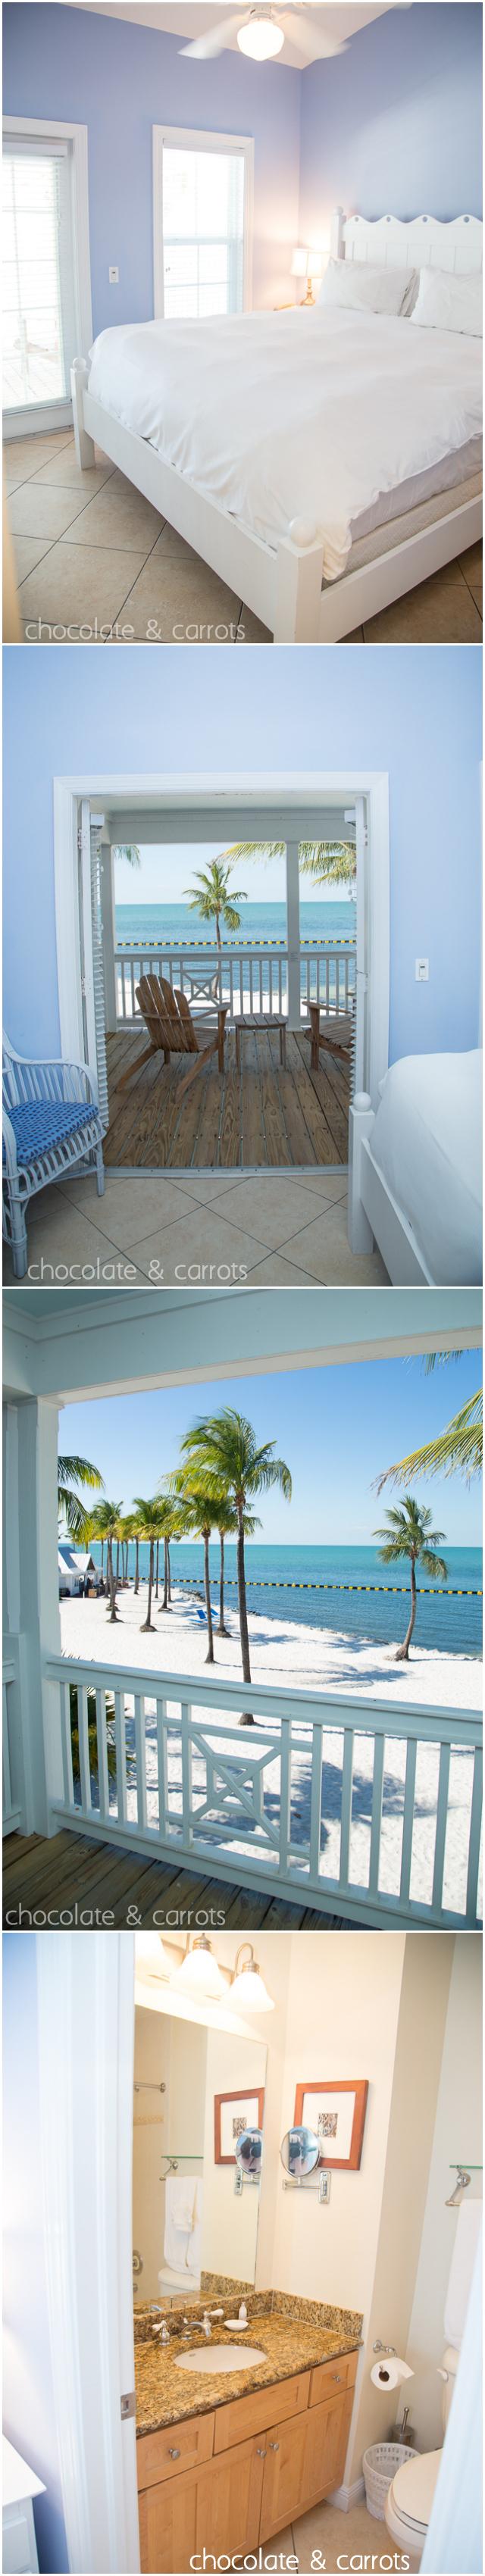 Tranquility Bay Beach Resort Master Bedroom | chocolateandcarrots.com